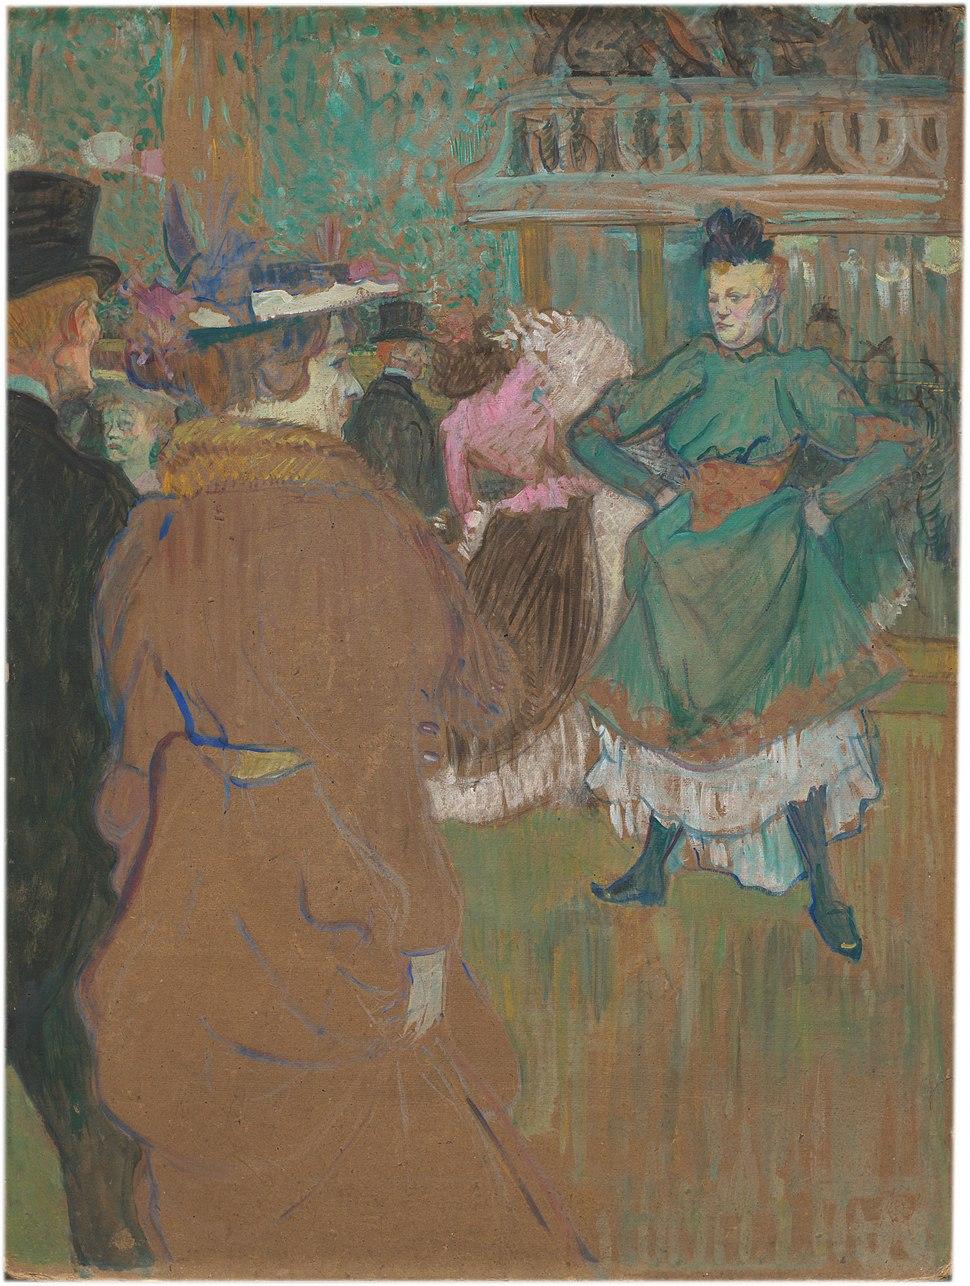 Toulouse-Lautrec - Quadrille NGA